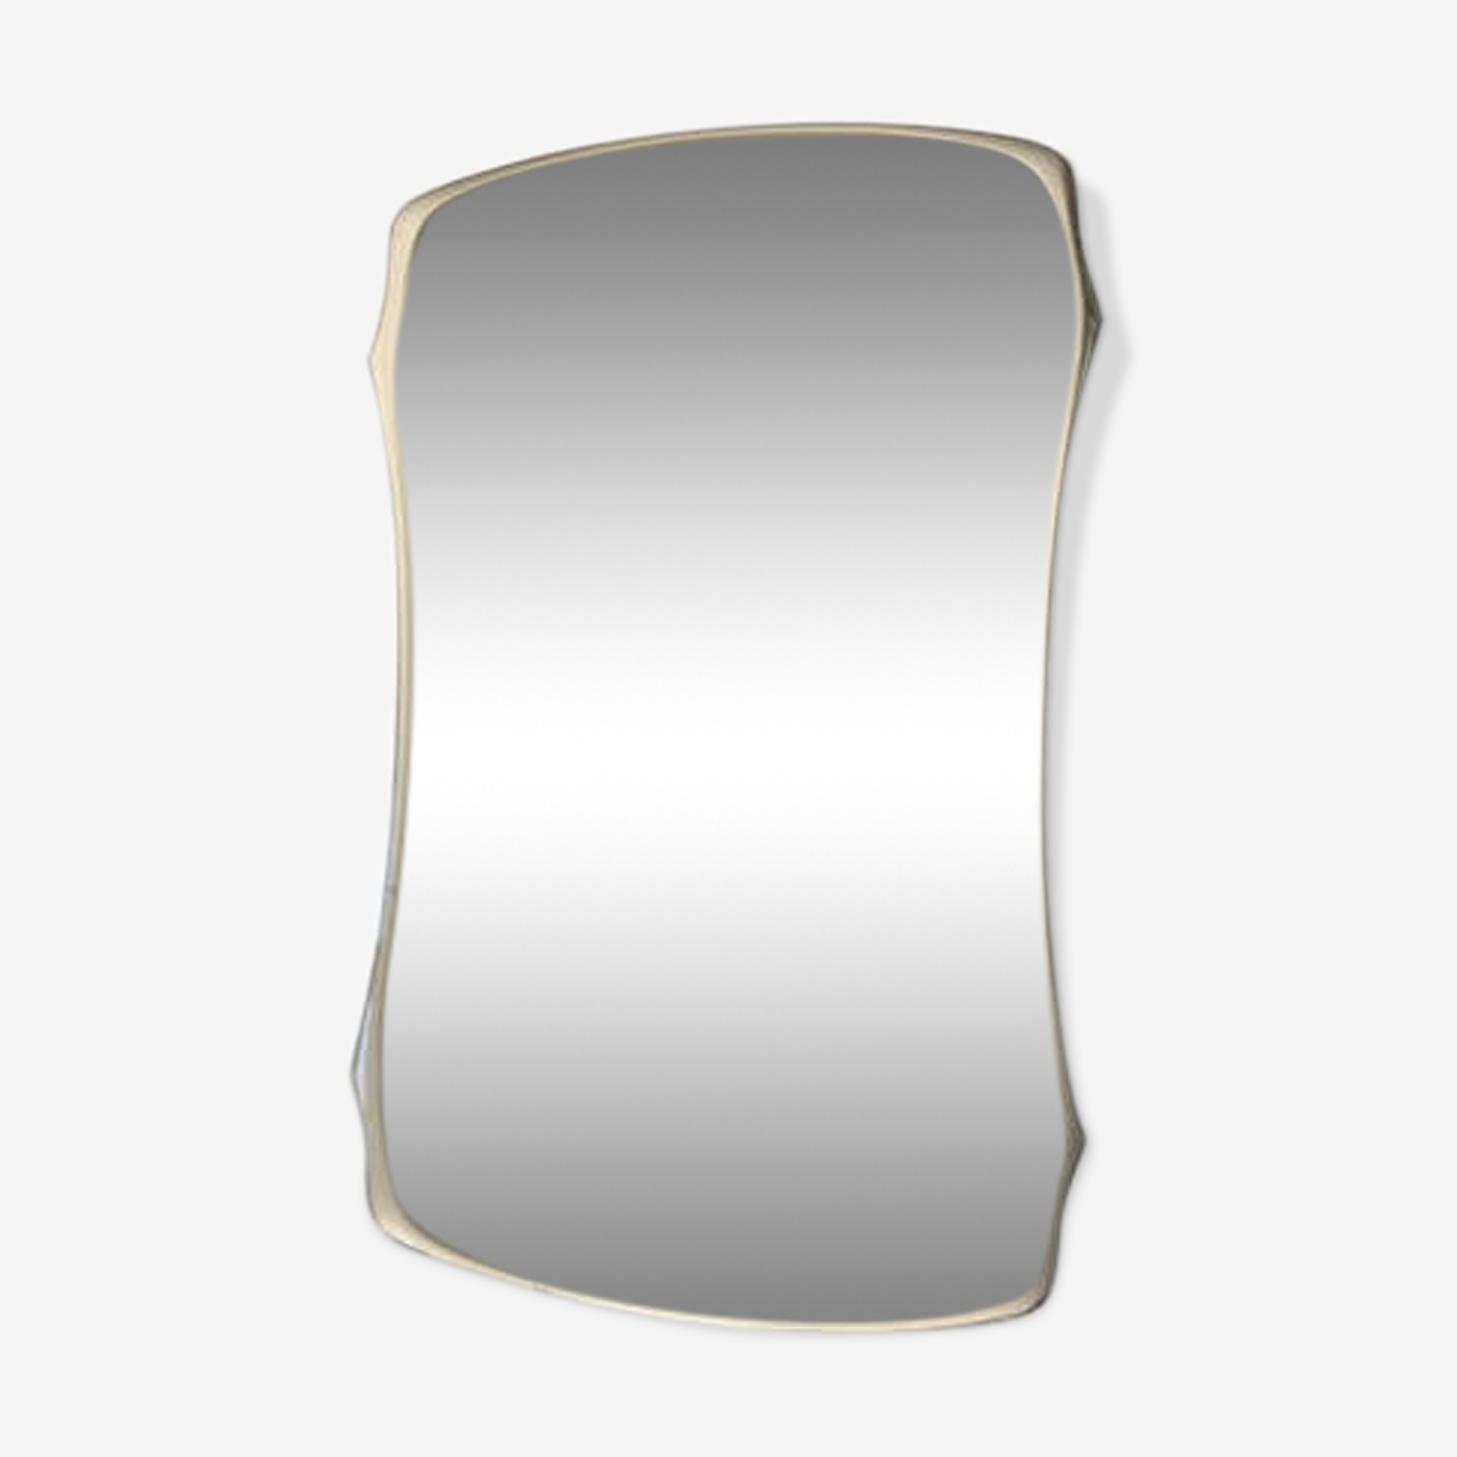 Mirror shape free vintage 69.5 x 45cm